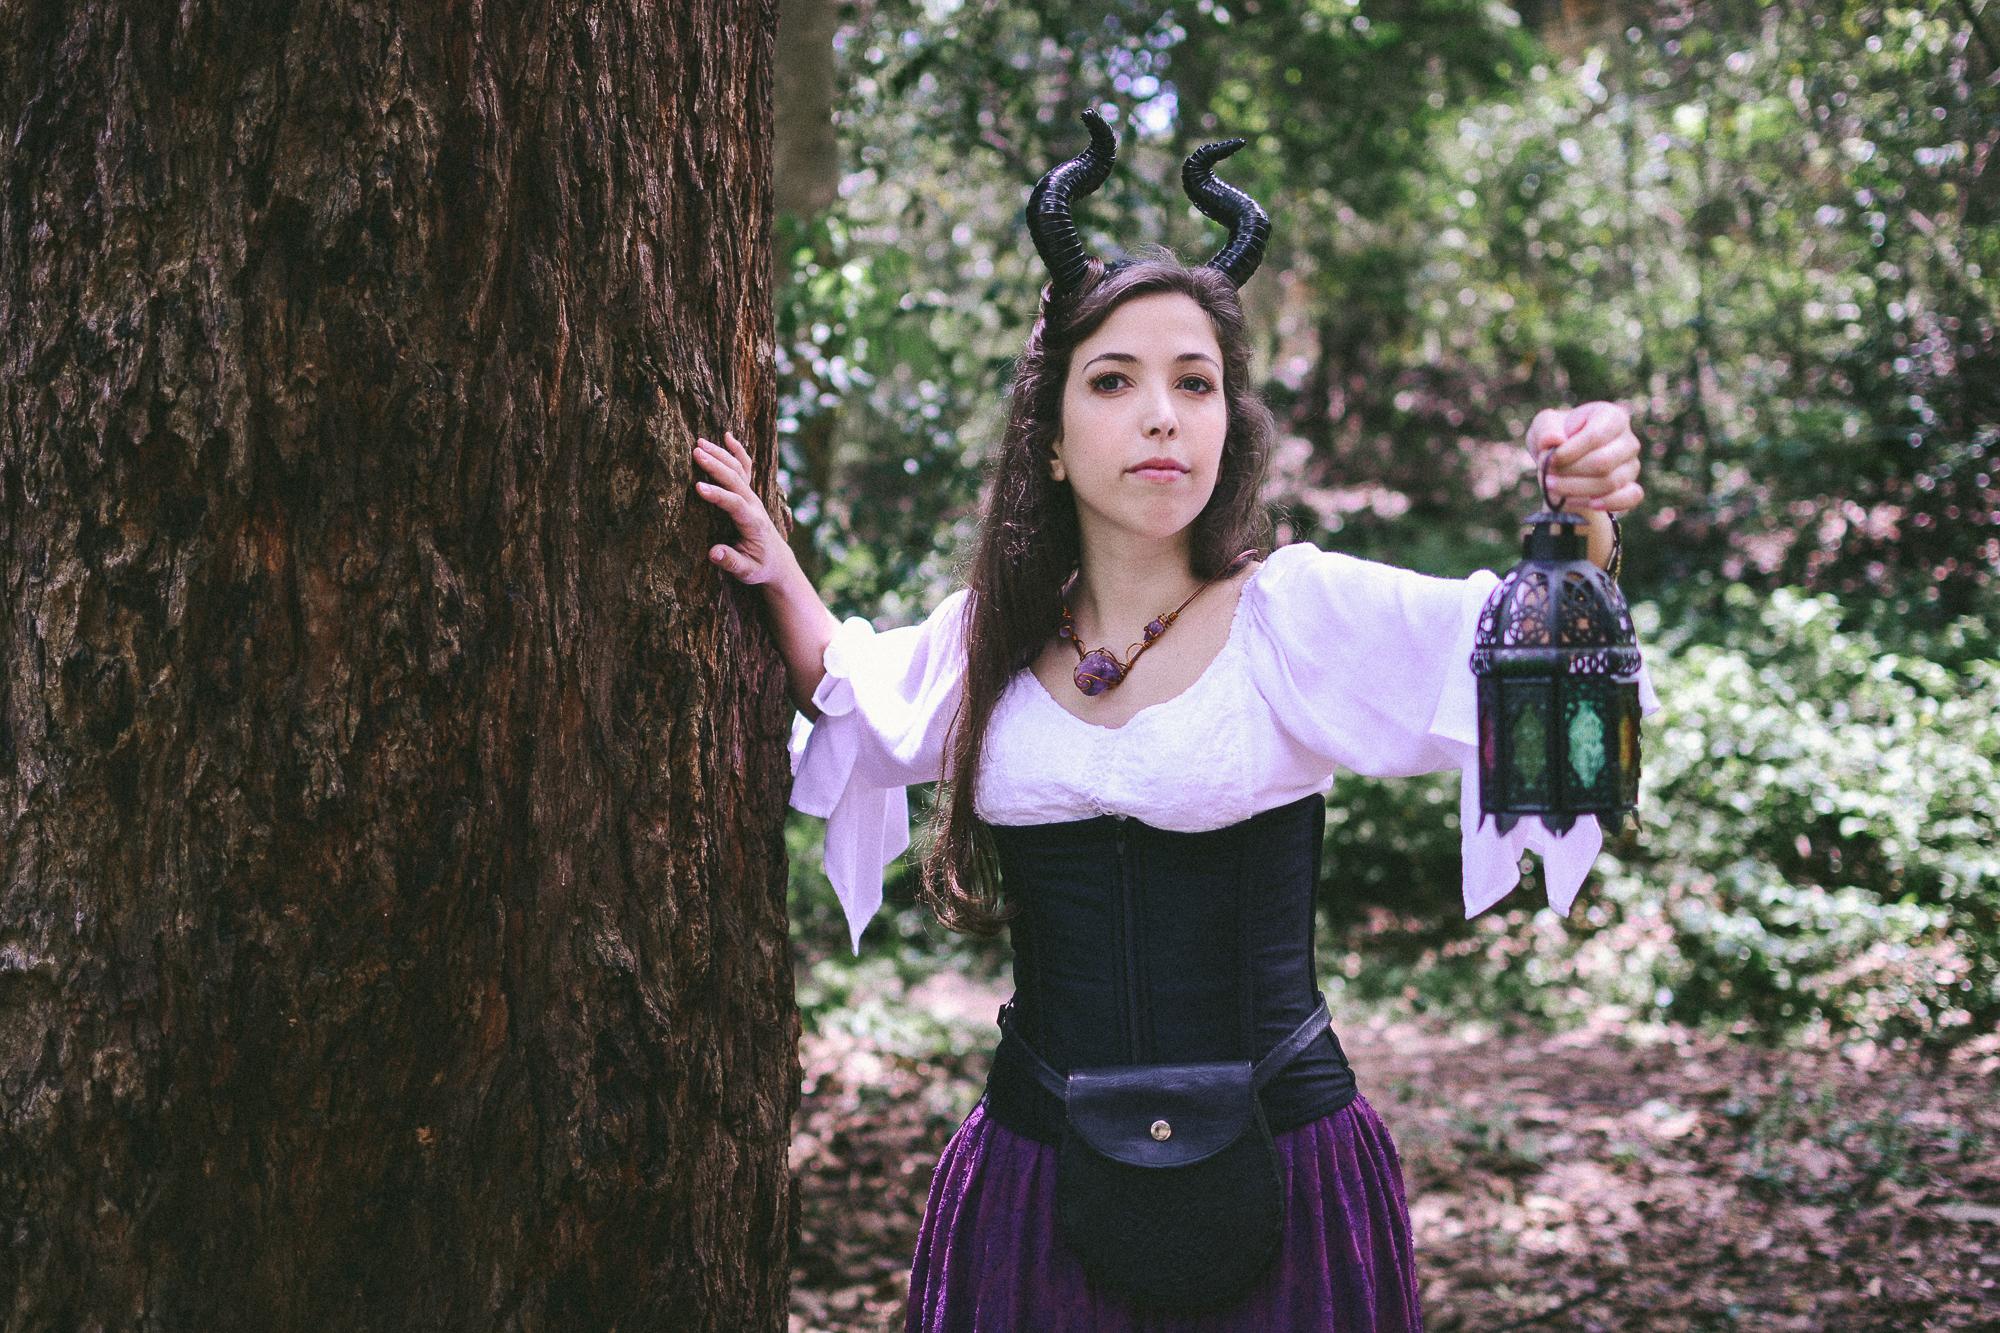 fada moderna bruxa floresta magia lanterna roxo chifres corset